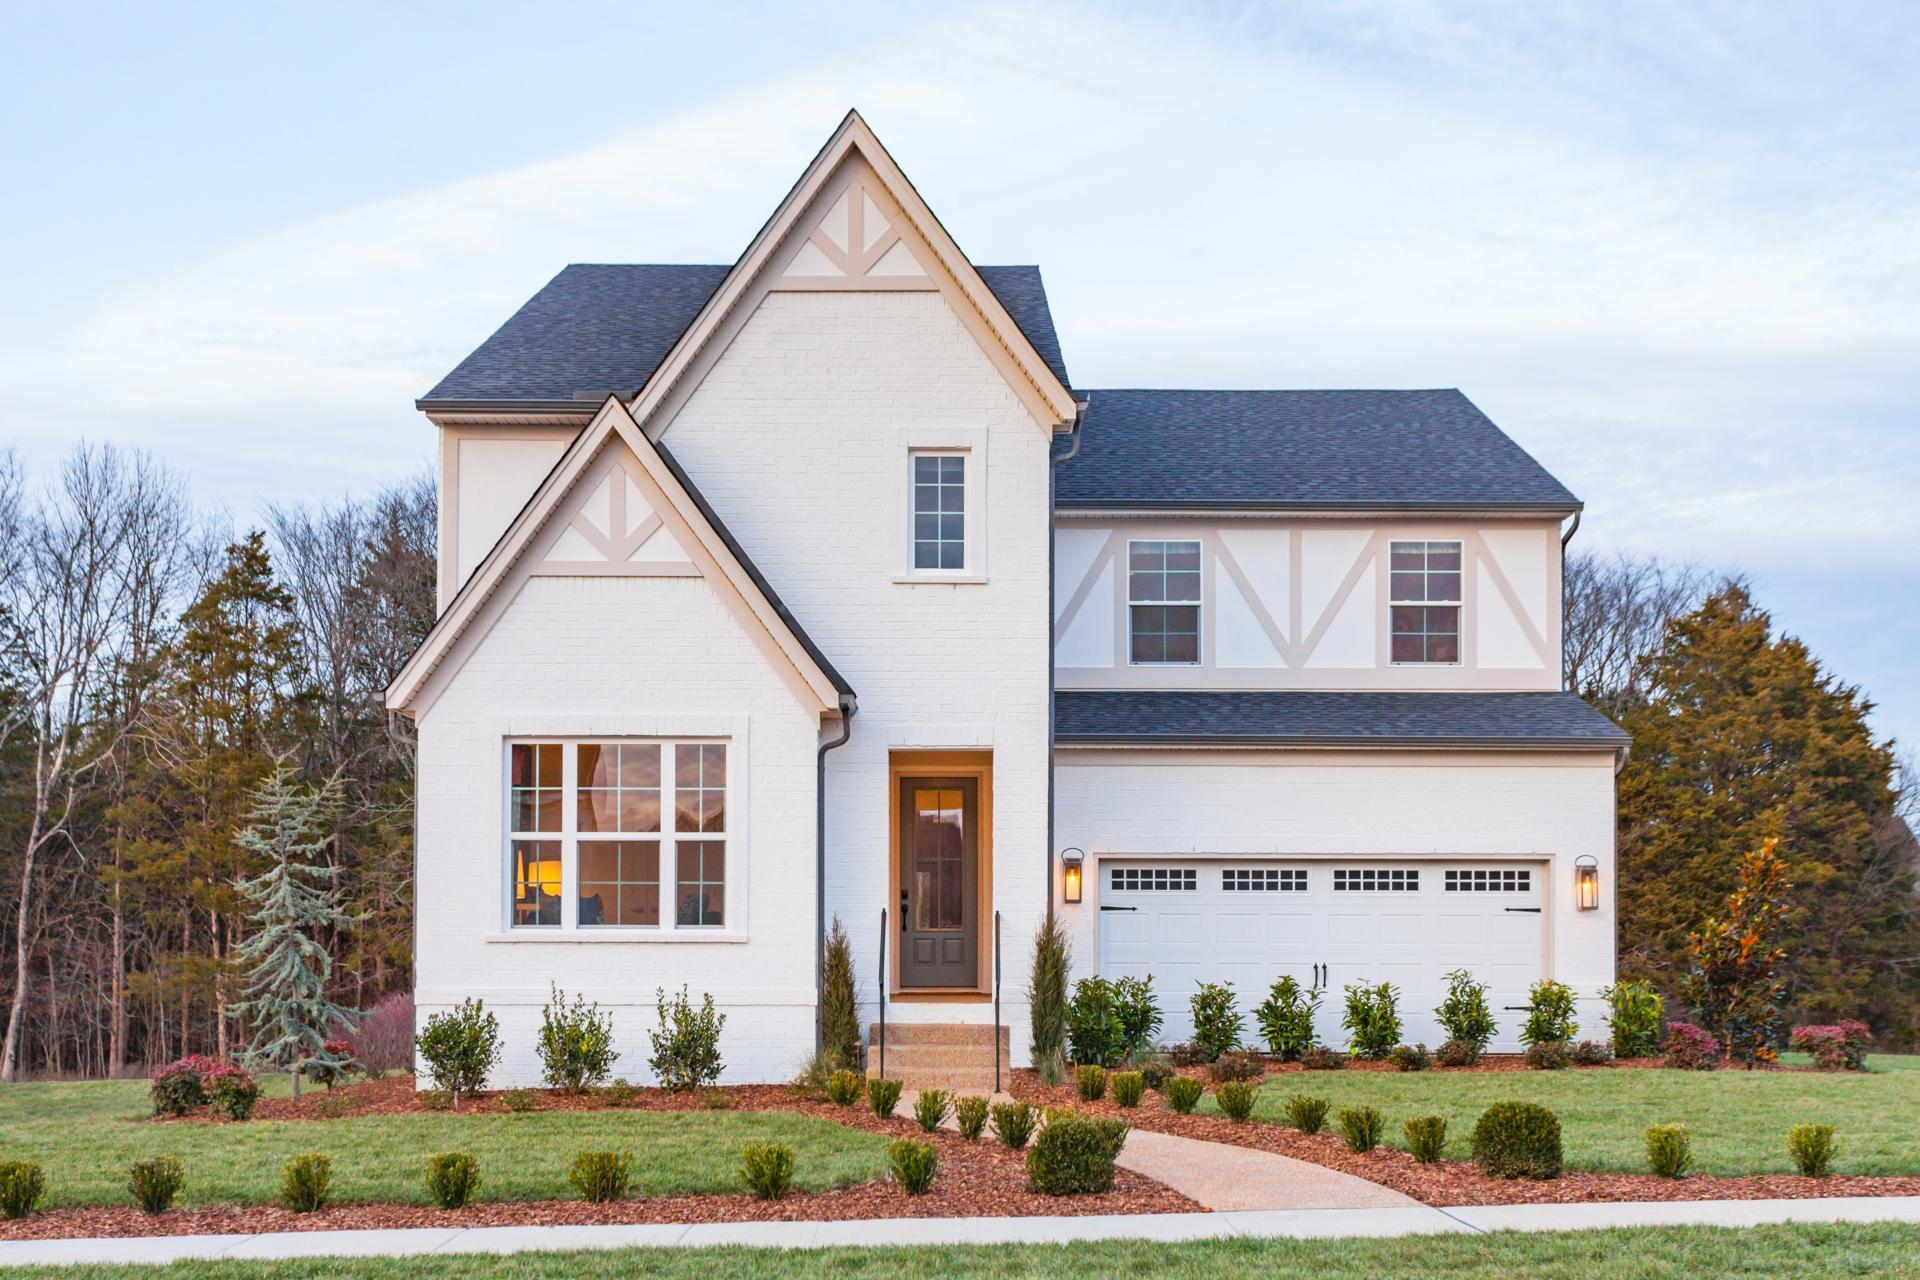 Homes for Sale in River Oaks Subdivision Lebanon TN